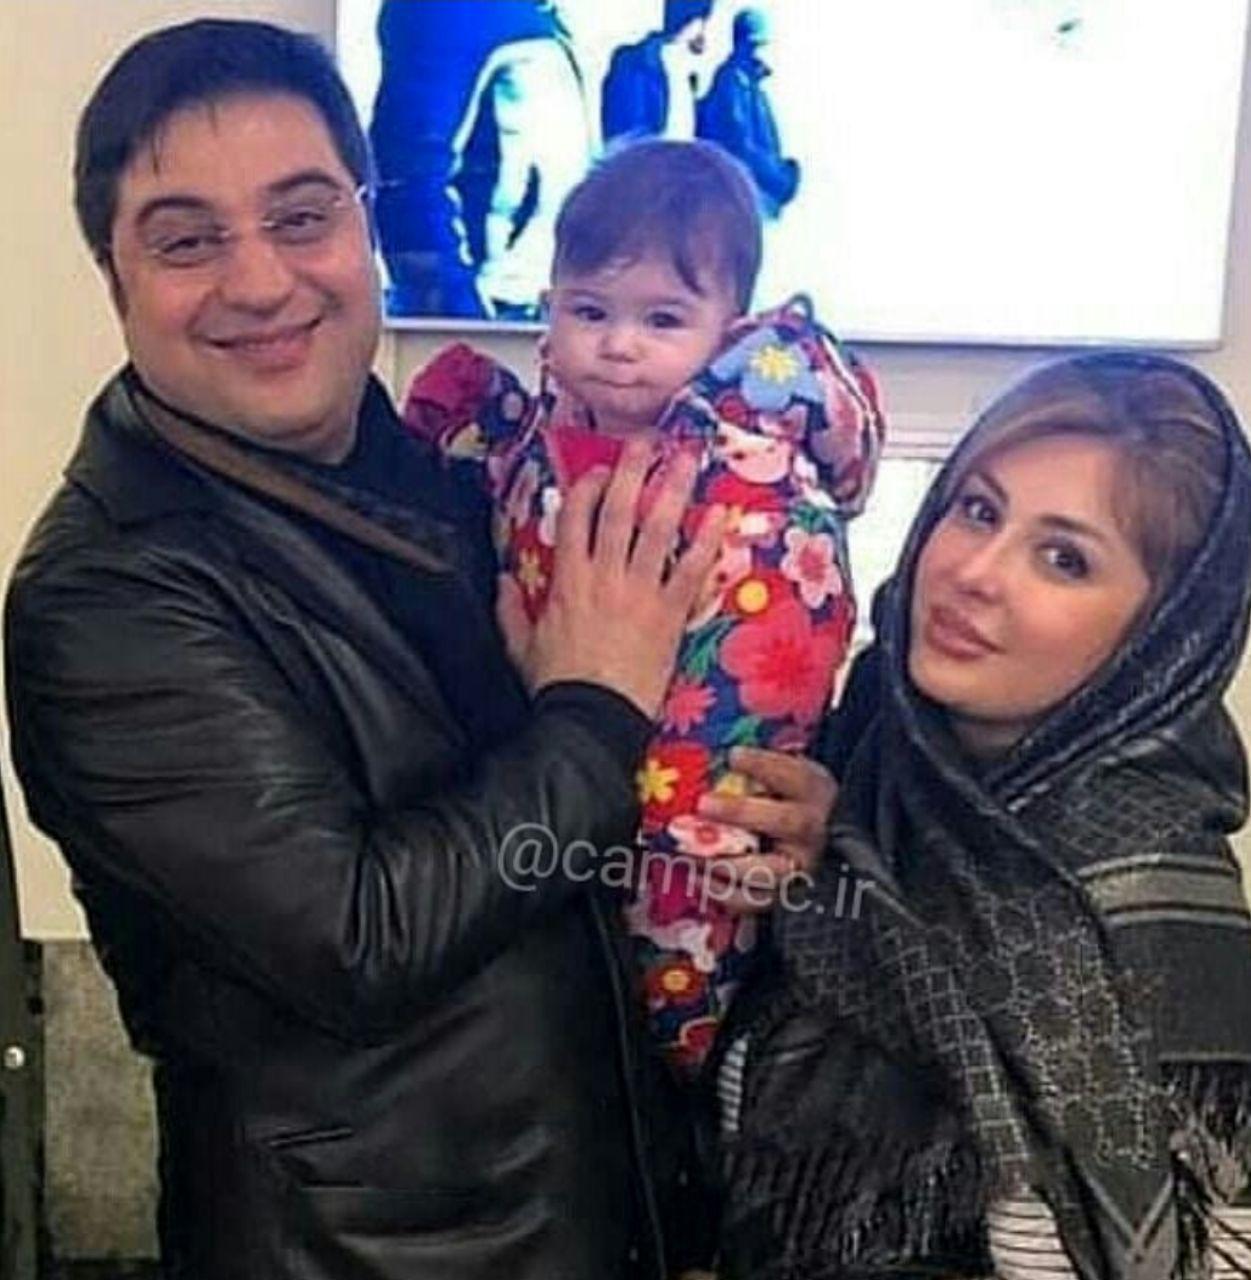 نیوشا ضیغمی، همسر و دخترش لنا/عکس